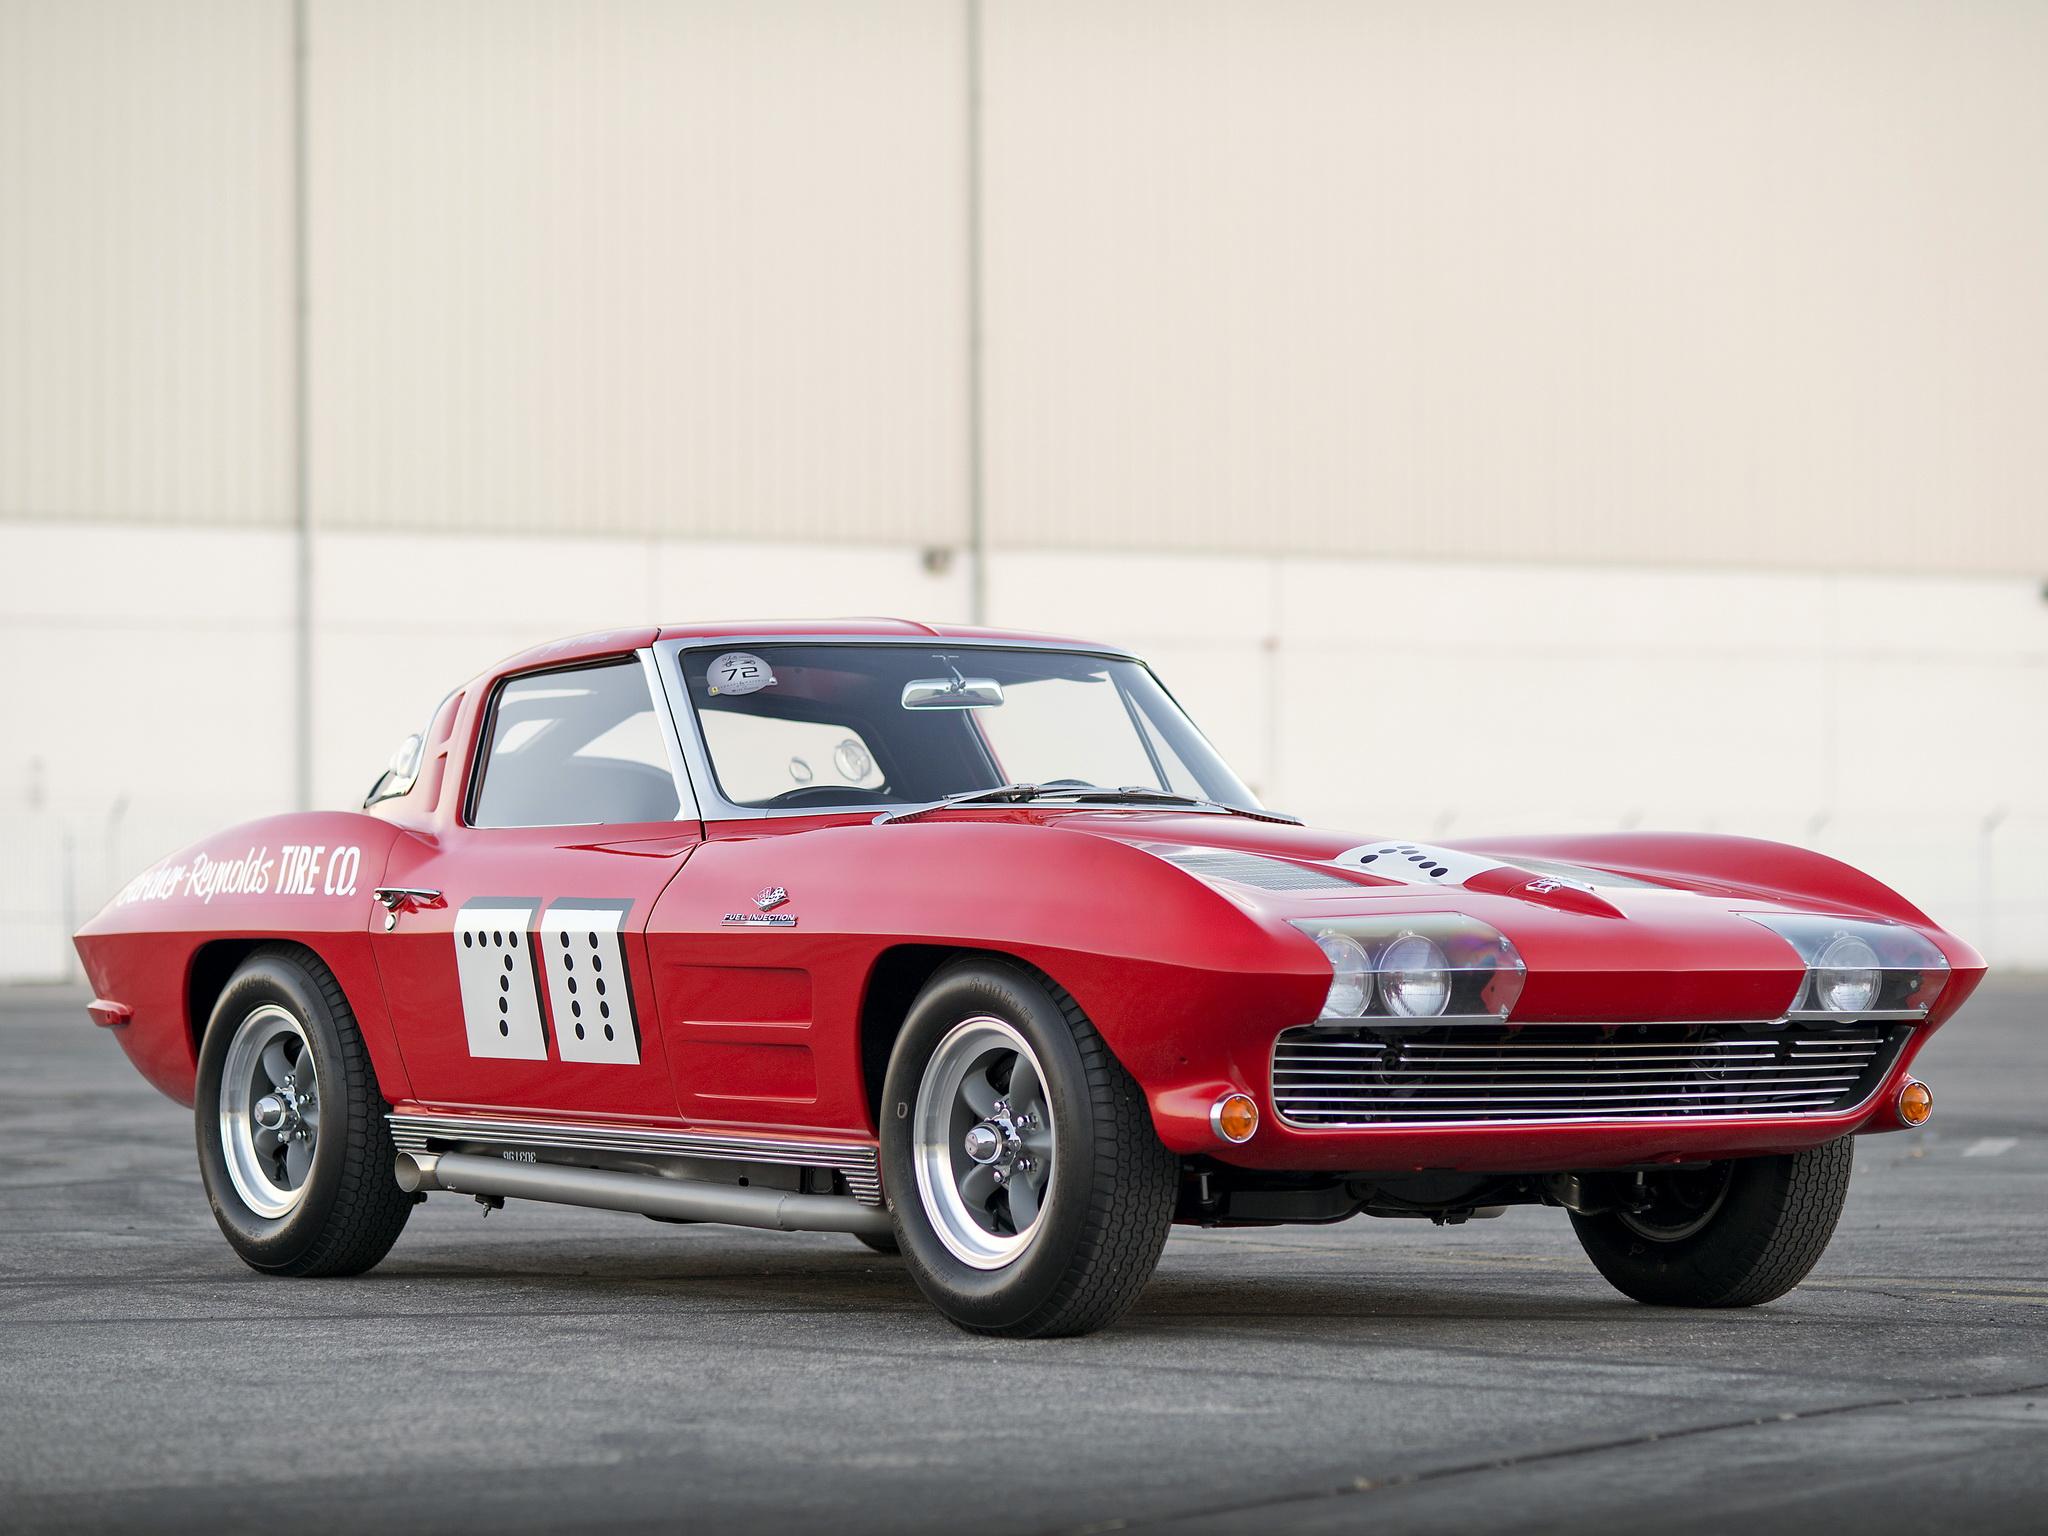 1969 Corvette Stingray >> 1963 Chevrolet Corvette Sting Ray Race Car 7-11 (C2 ...